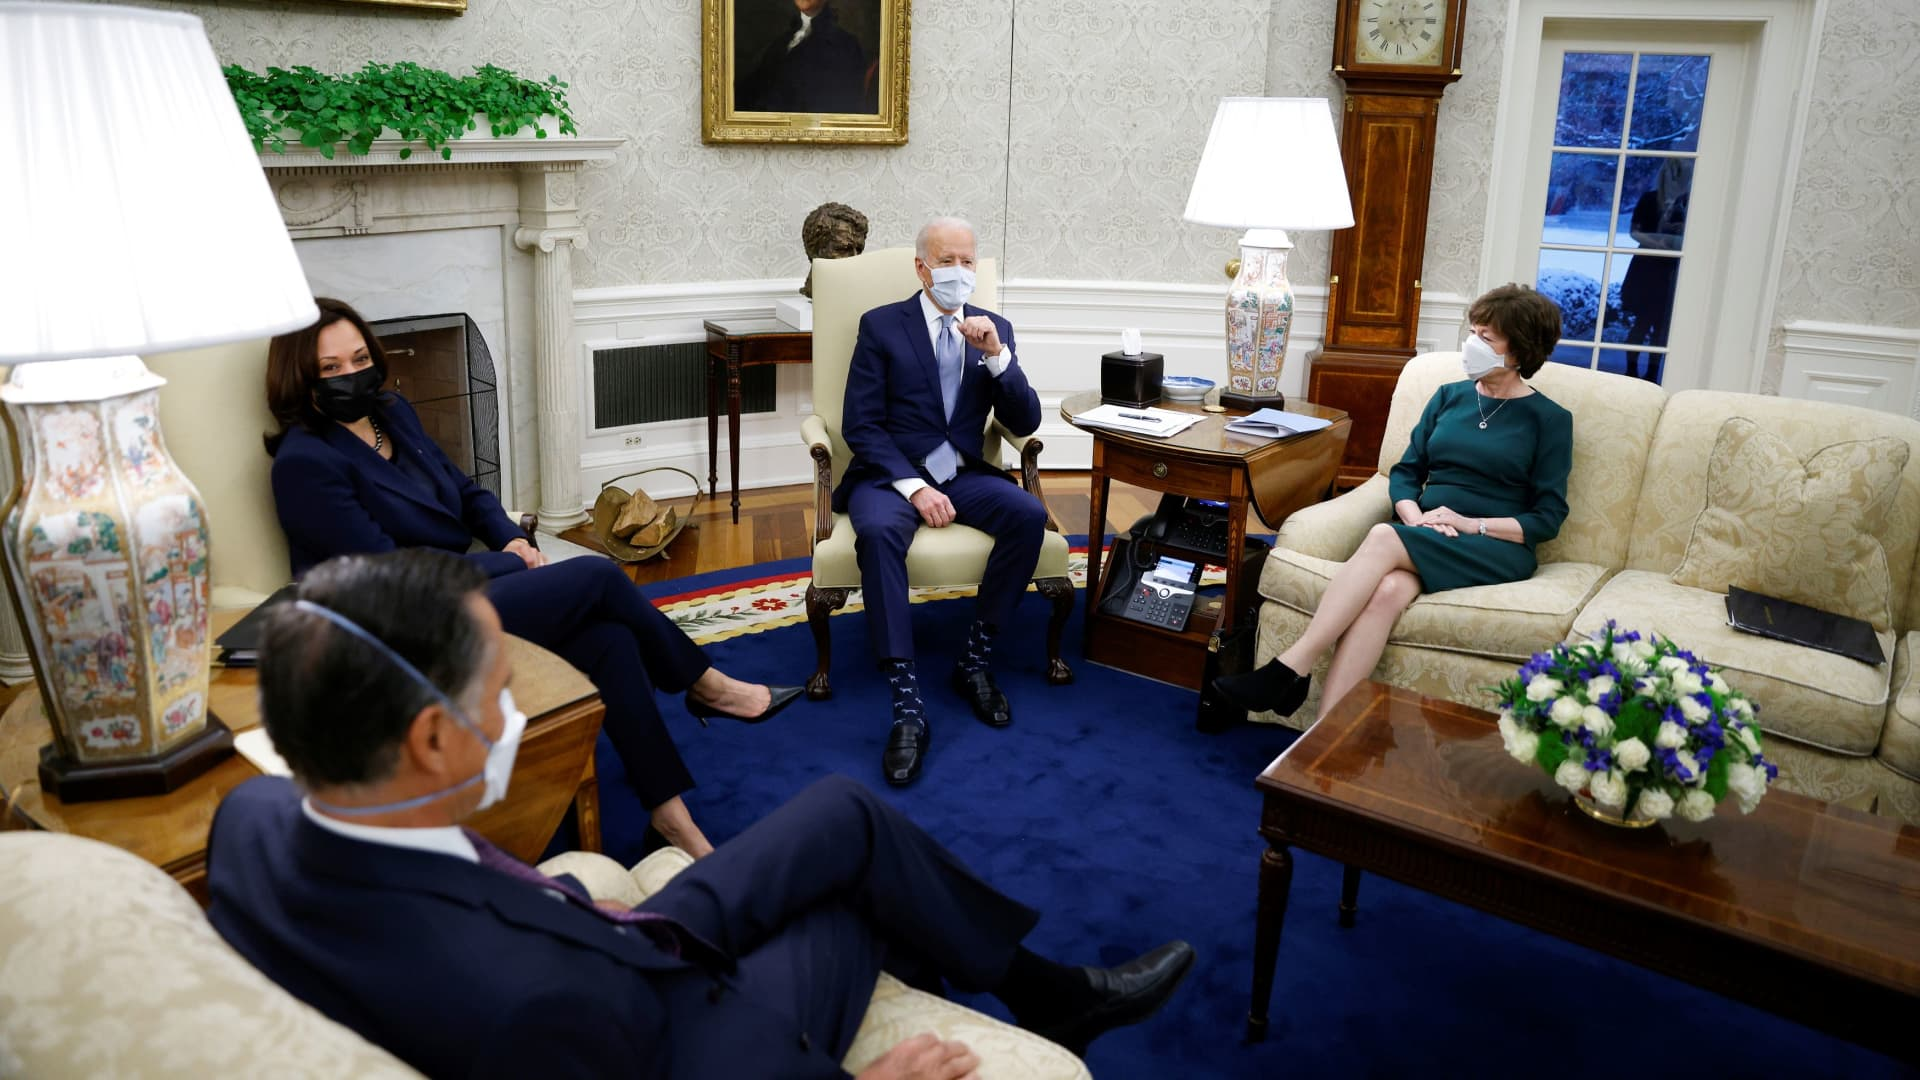 President Joe Biden and Vice President Kamala Harris meet with a group of Republican senators to discuss coronavirus federal aid legislation inside the Oval Office on Feb. 1, 2021.